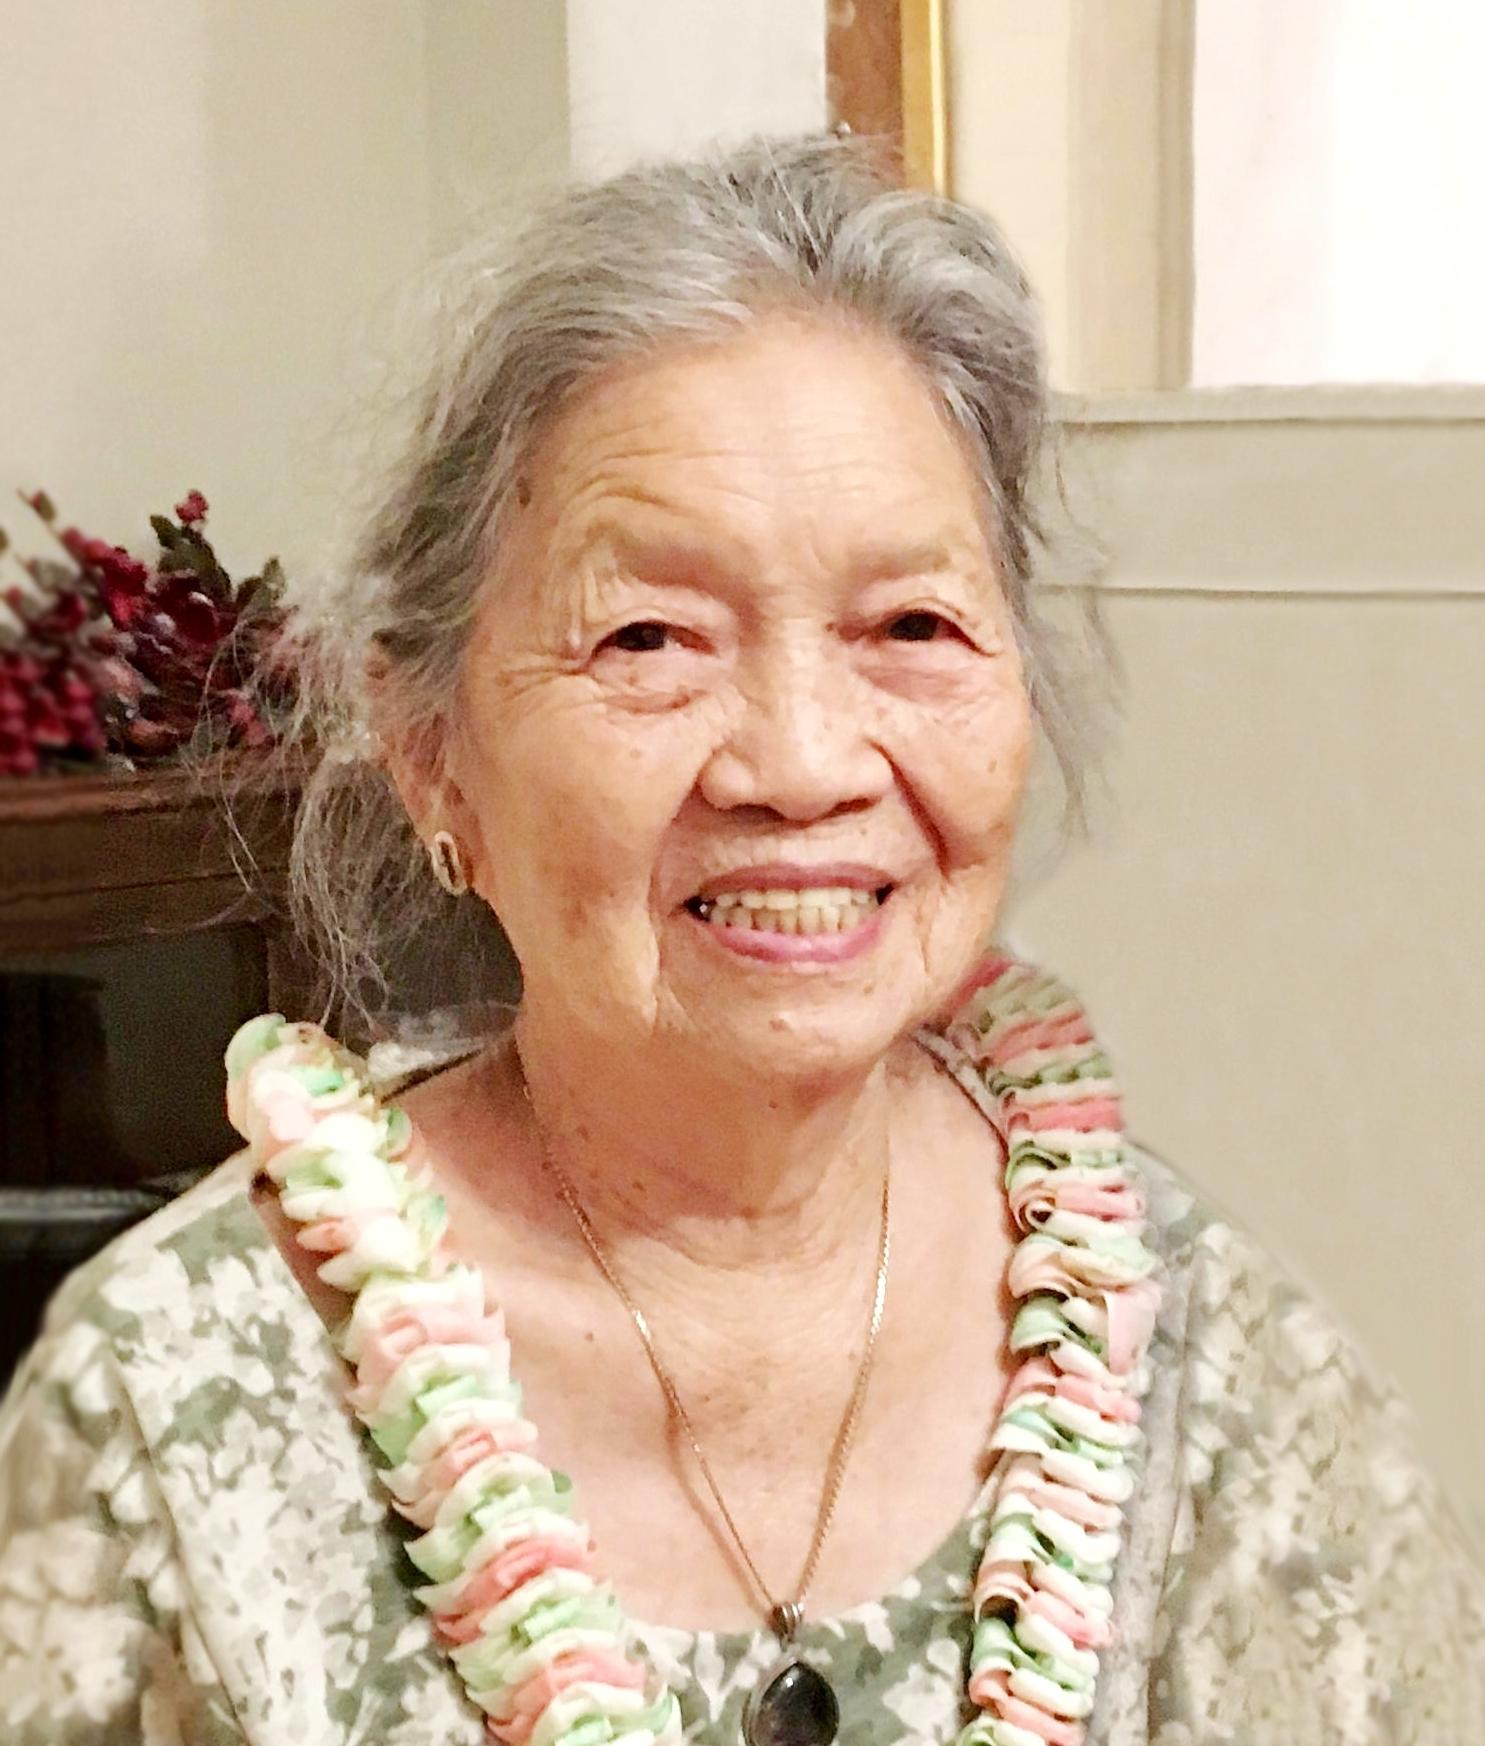 Barbara Mau